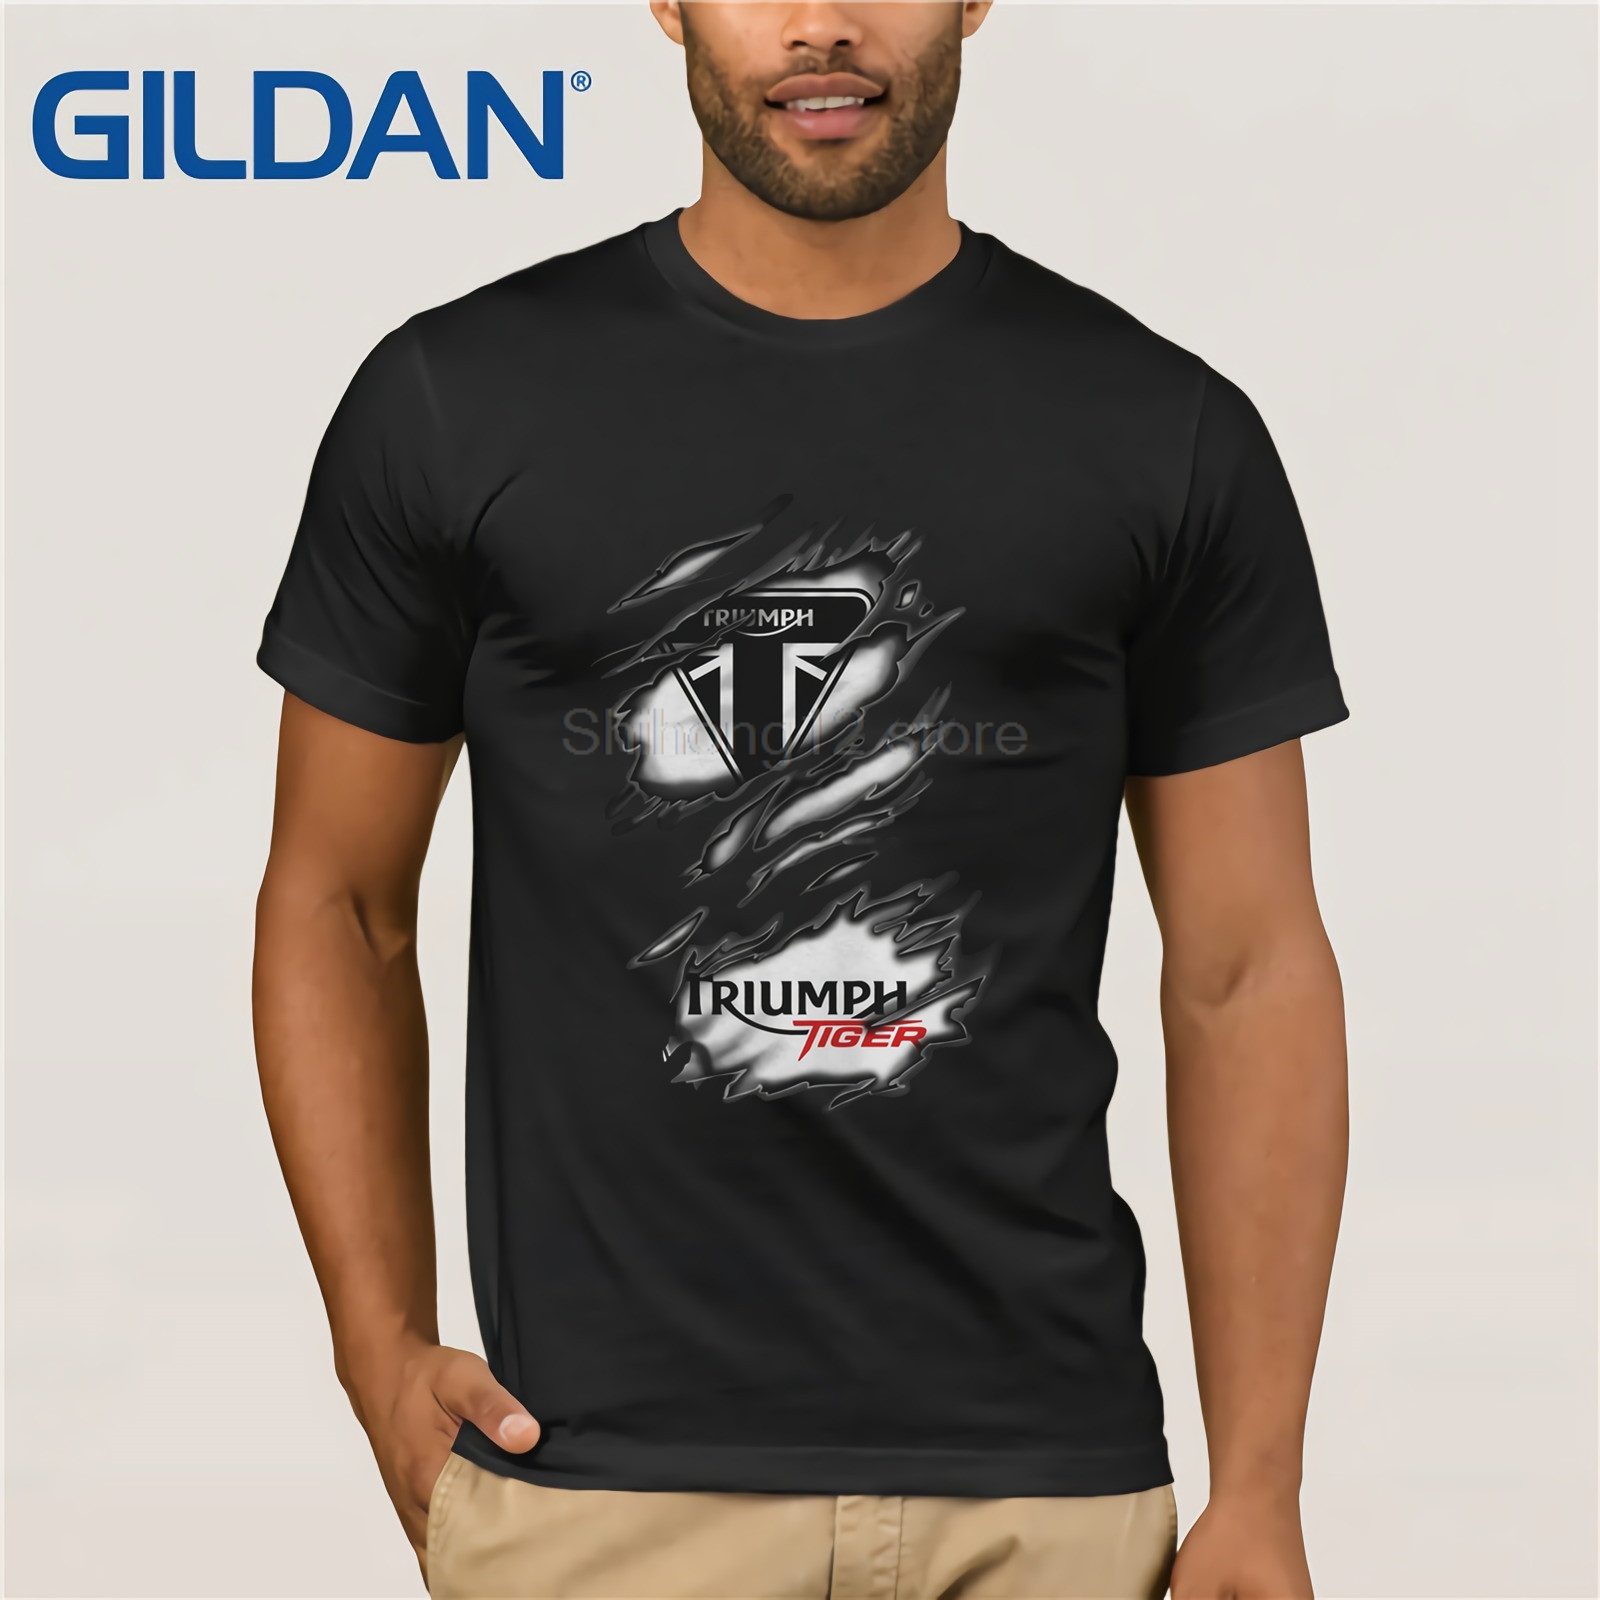 ac8fd80e Buy gildan t shirts and get free shipping on AliExpress.com